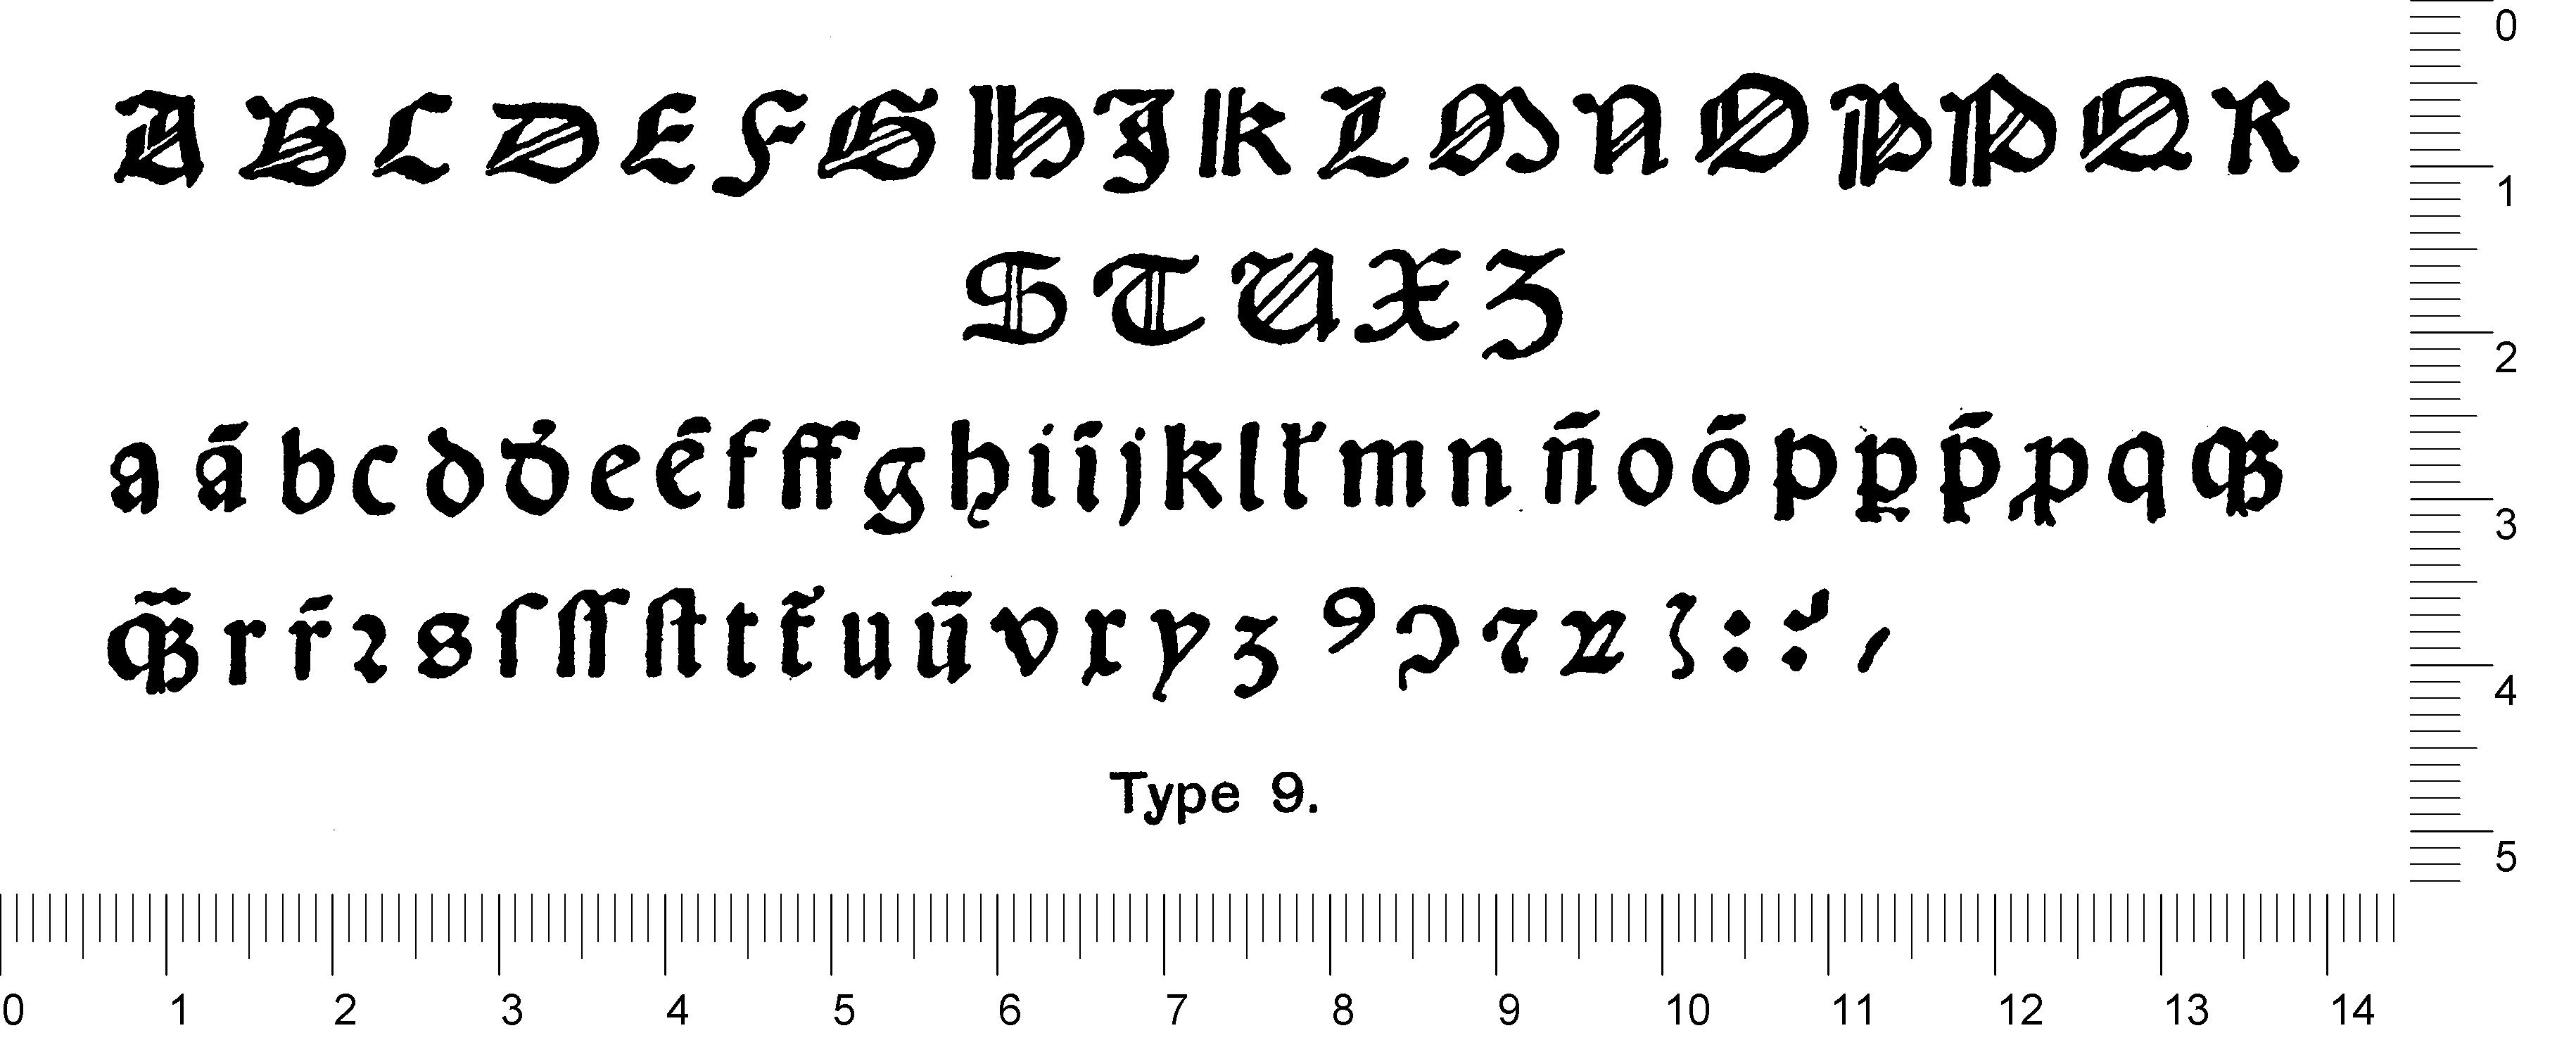 ratdolt-type-9-GfT0603.1